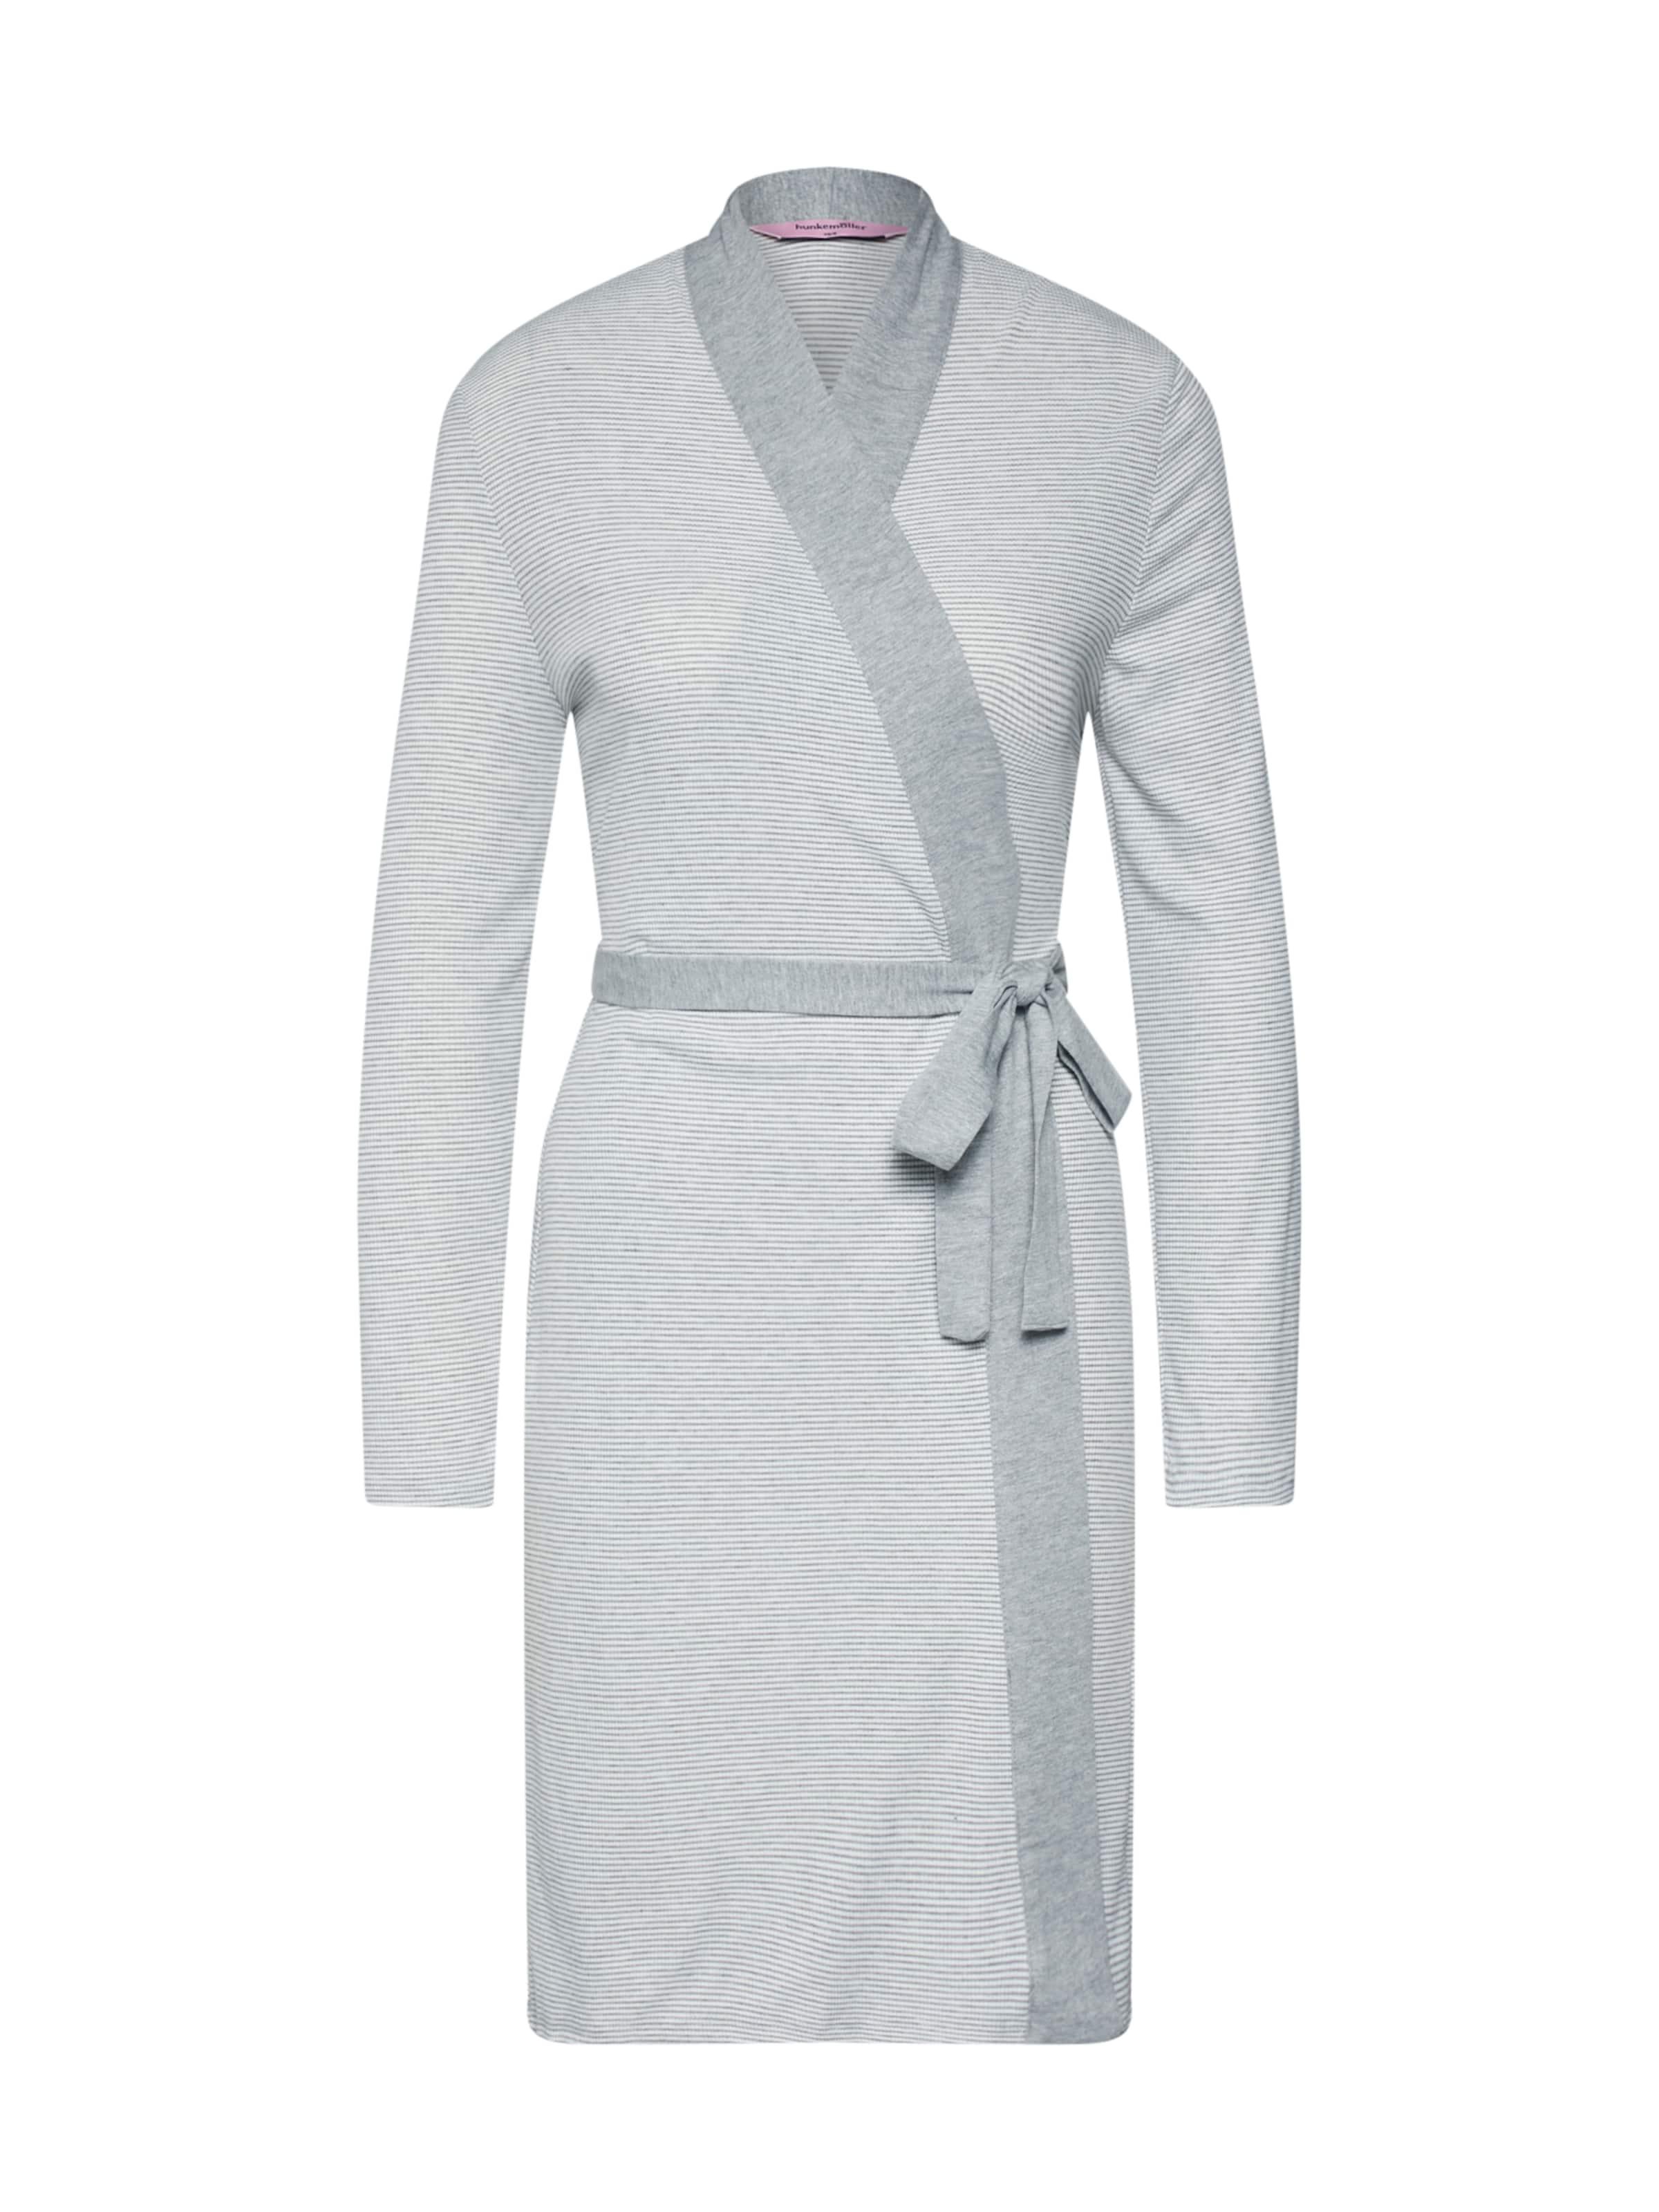 Rib' Morgenmantel Jersey In 'robe Grau Hunkemöller CdBoxe